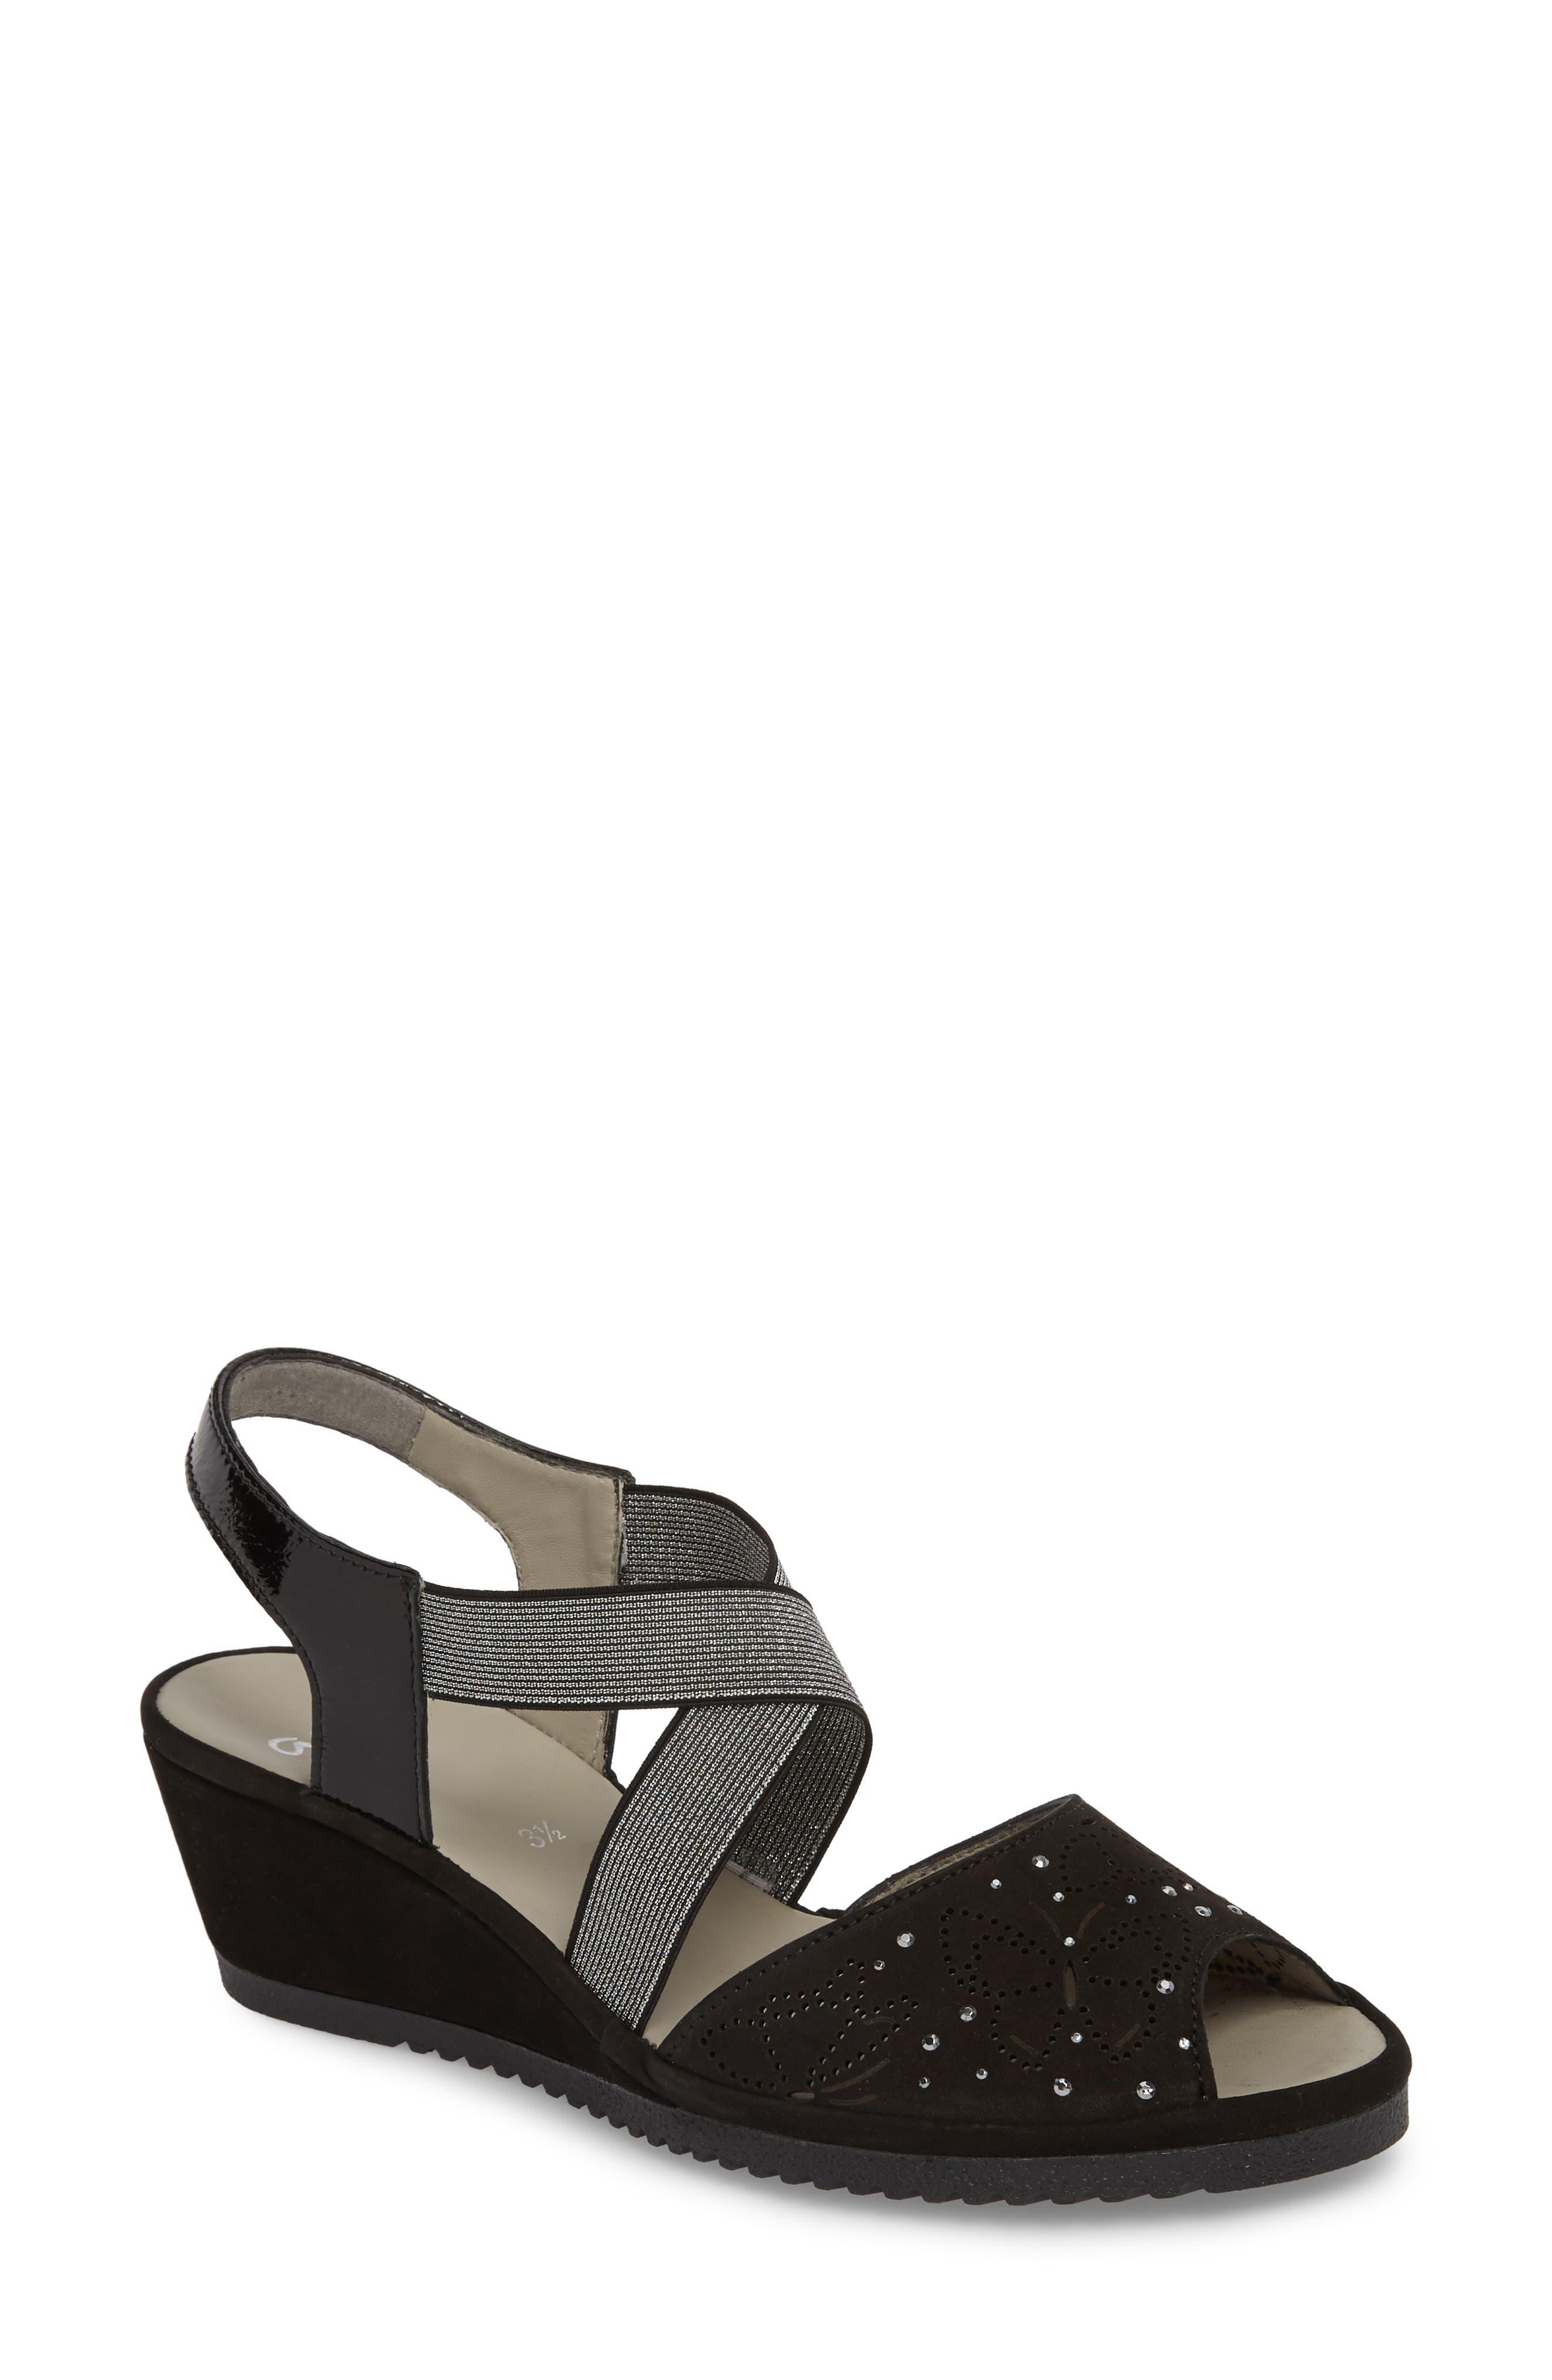 Celia Wedge Sandal,                             Main thumbnail 1, color,                             BLACK NUBUCK